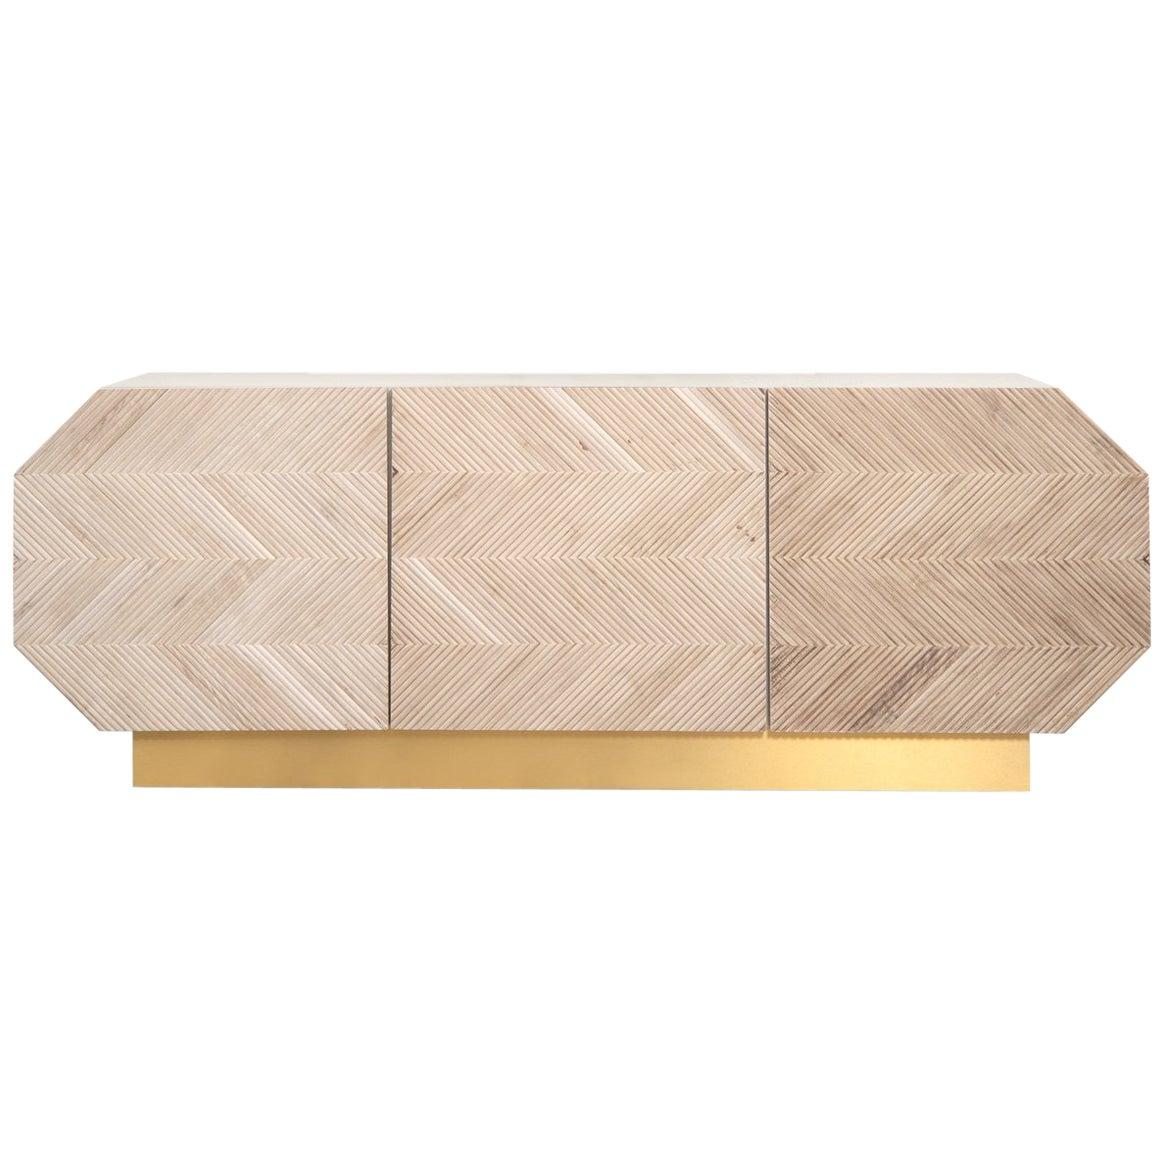 Mid-Century Modern Octagonal Walnut Wood Sideboard with Brass Toe Kick